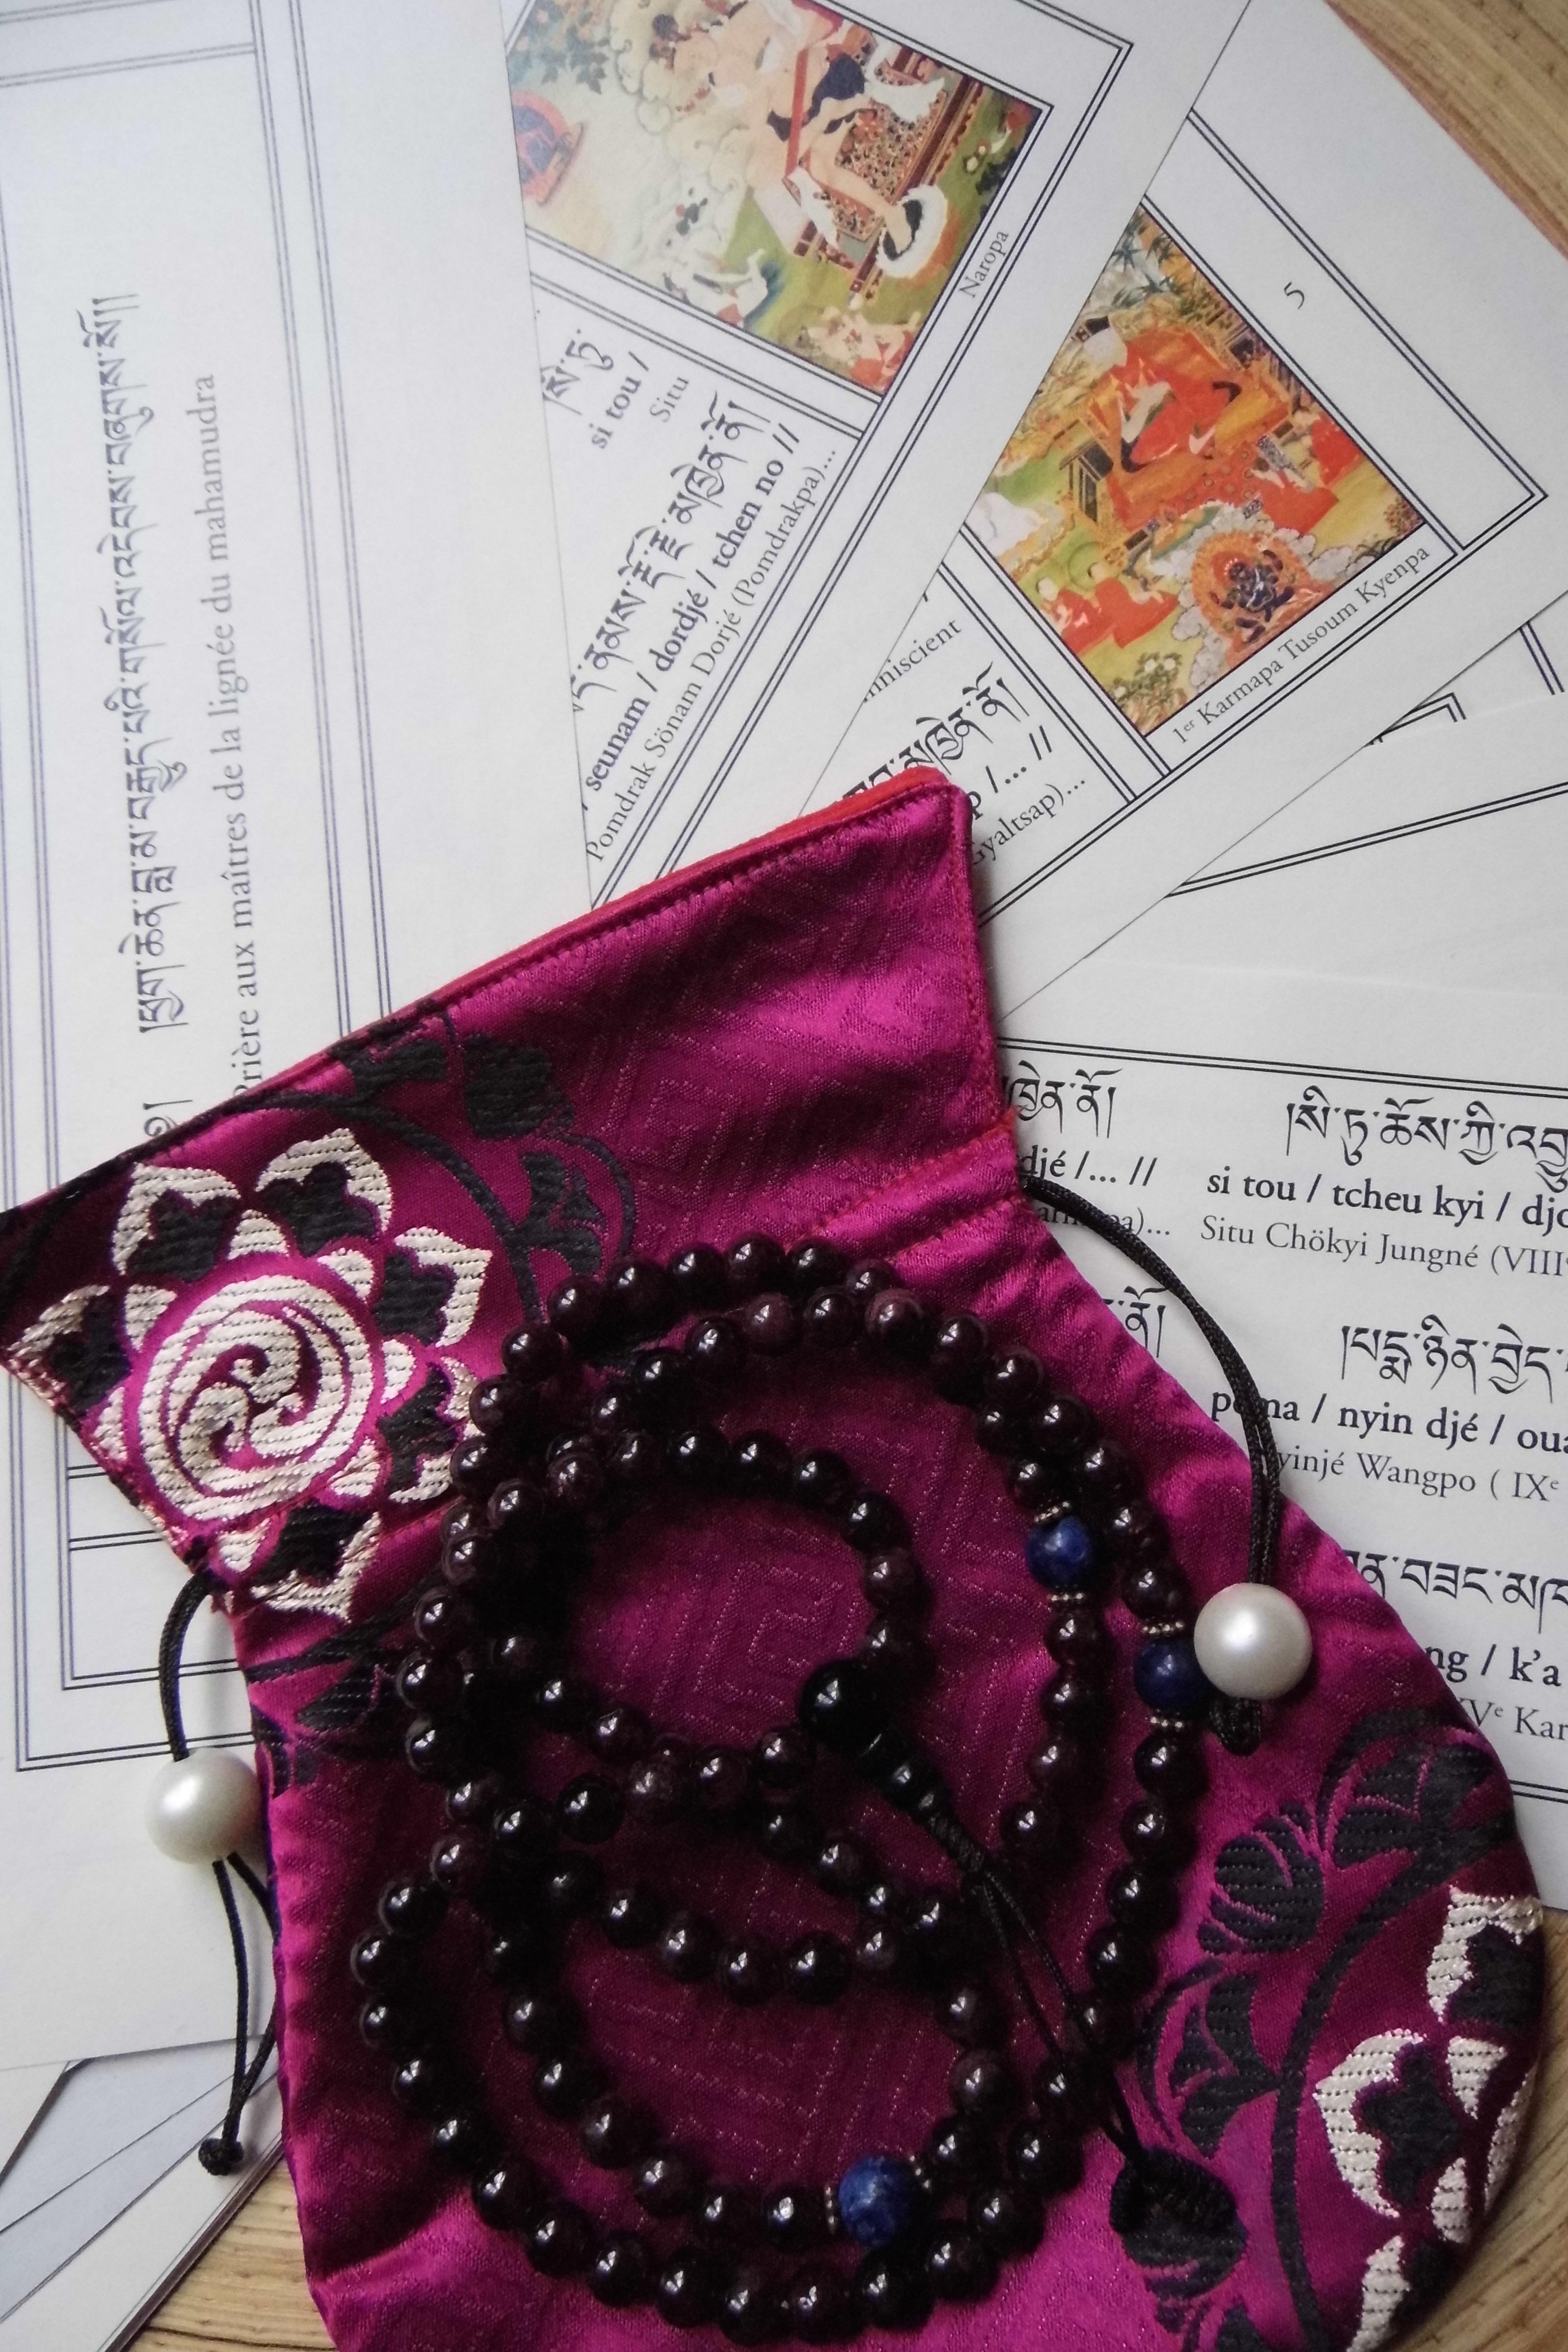 Catherine Lirot dharma bodhisattva éveil mantra